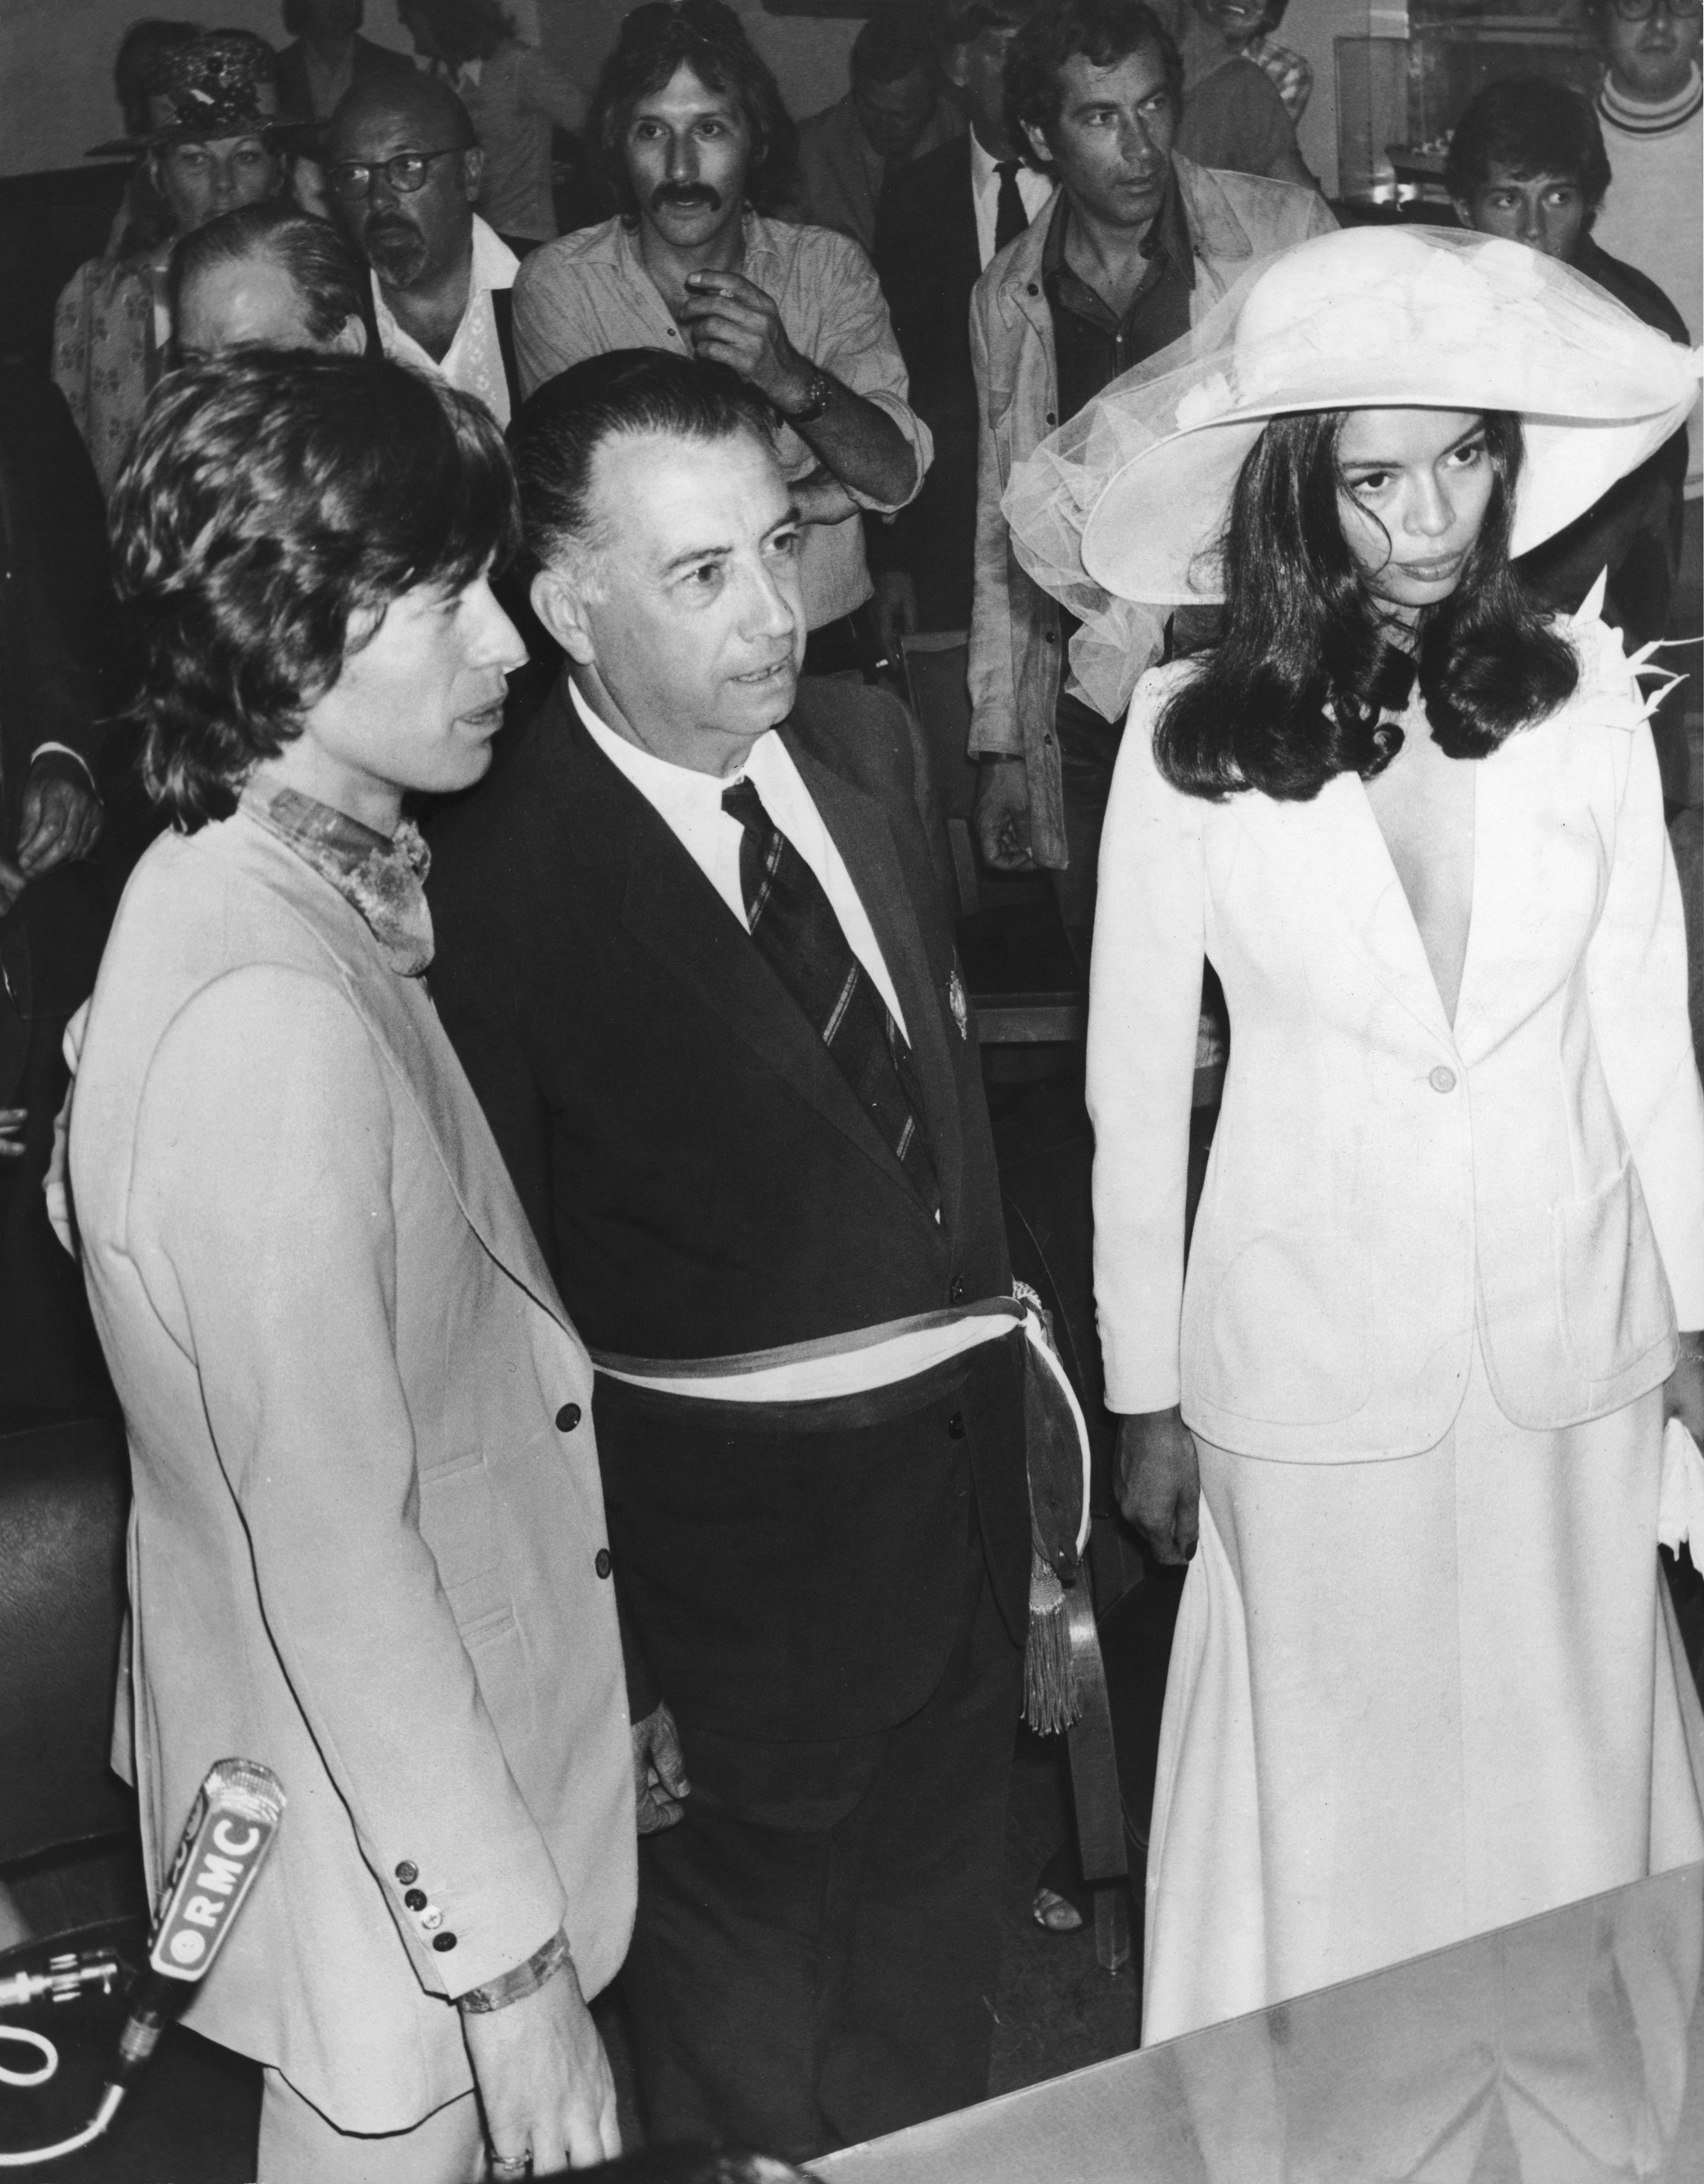 mick jagger and bianca perez morena de macias got married